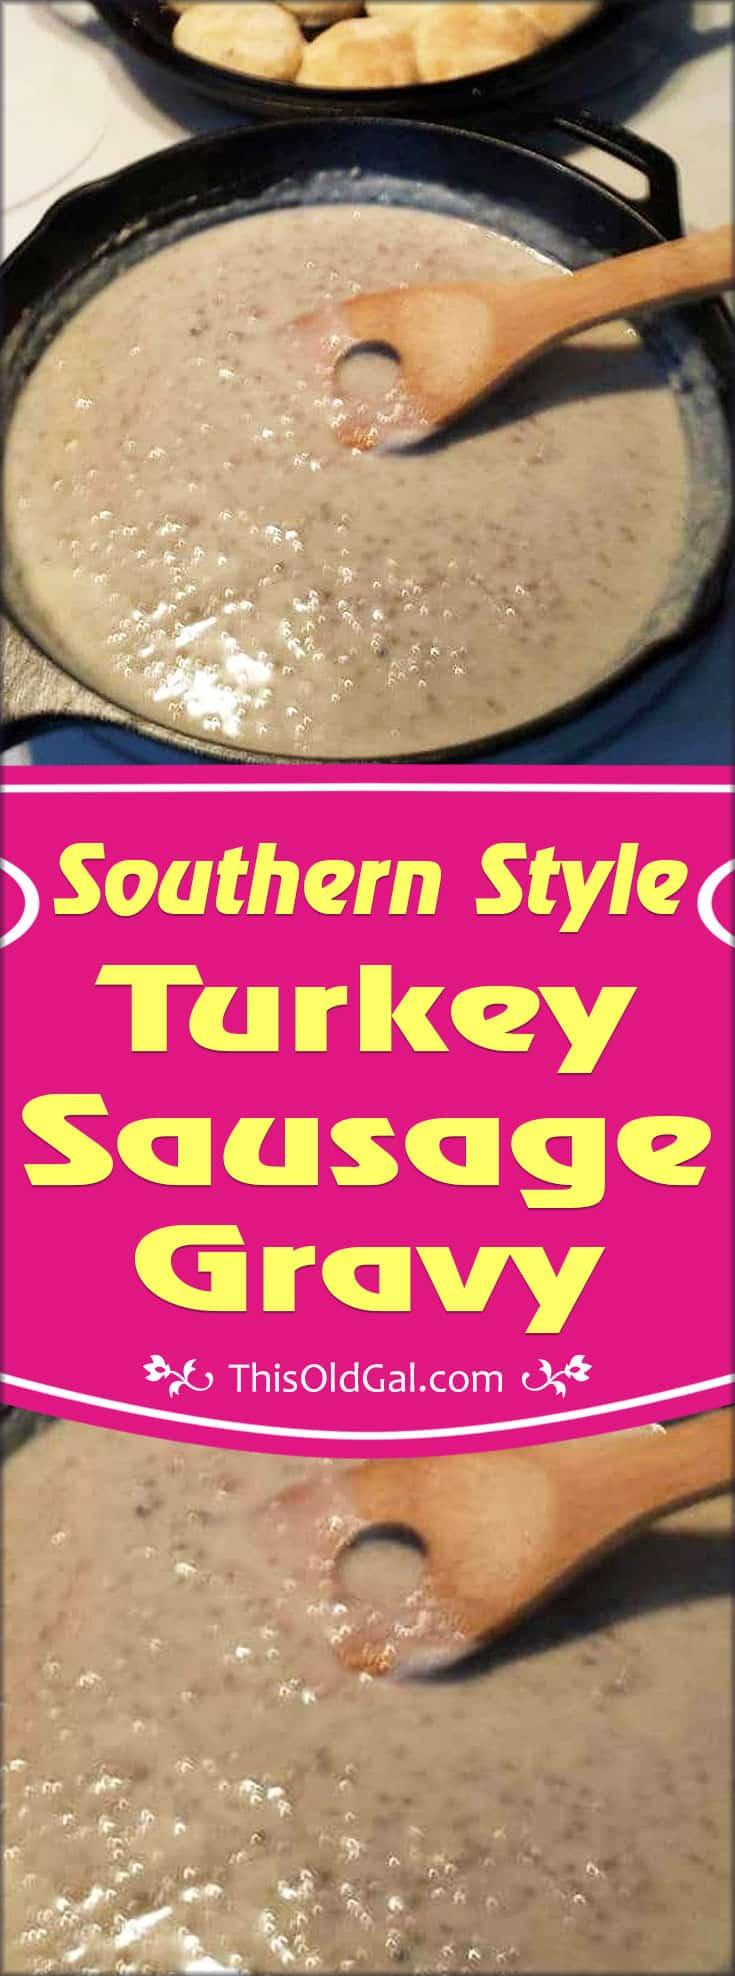 Southern Style Turkey Sausage Gravy